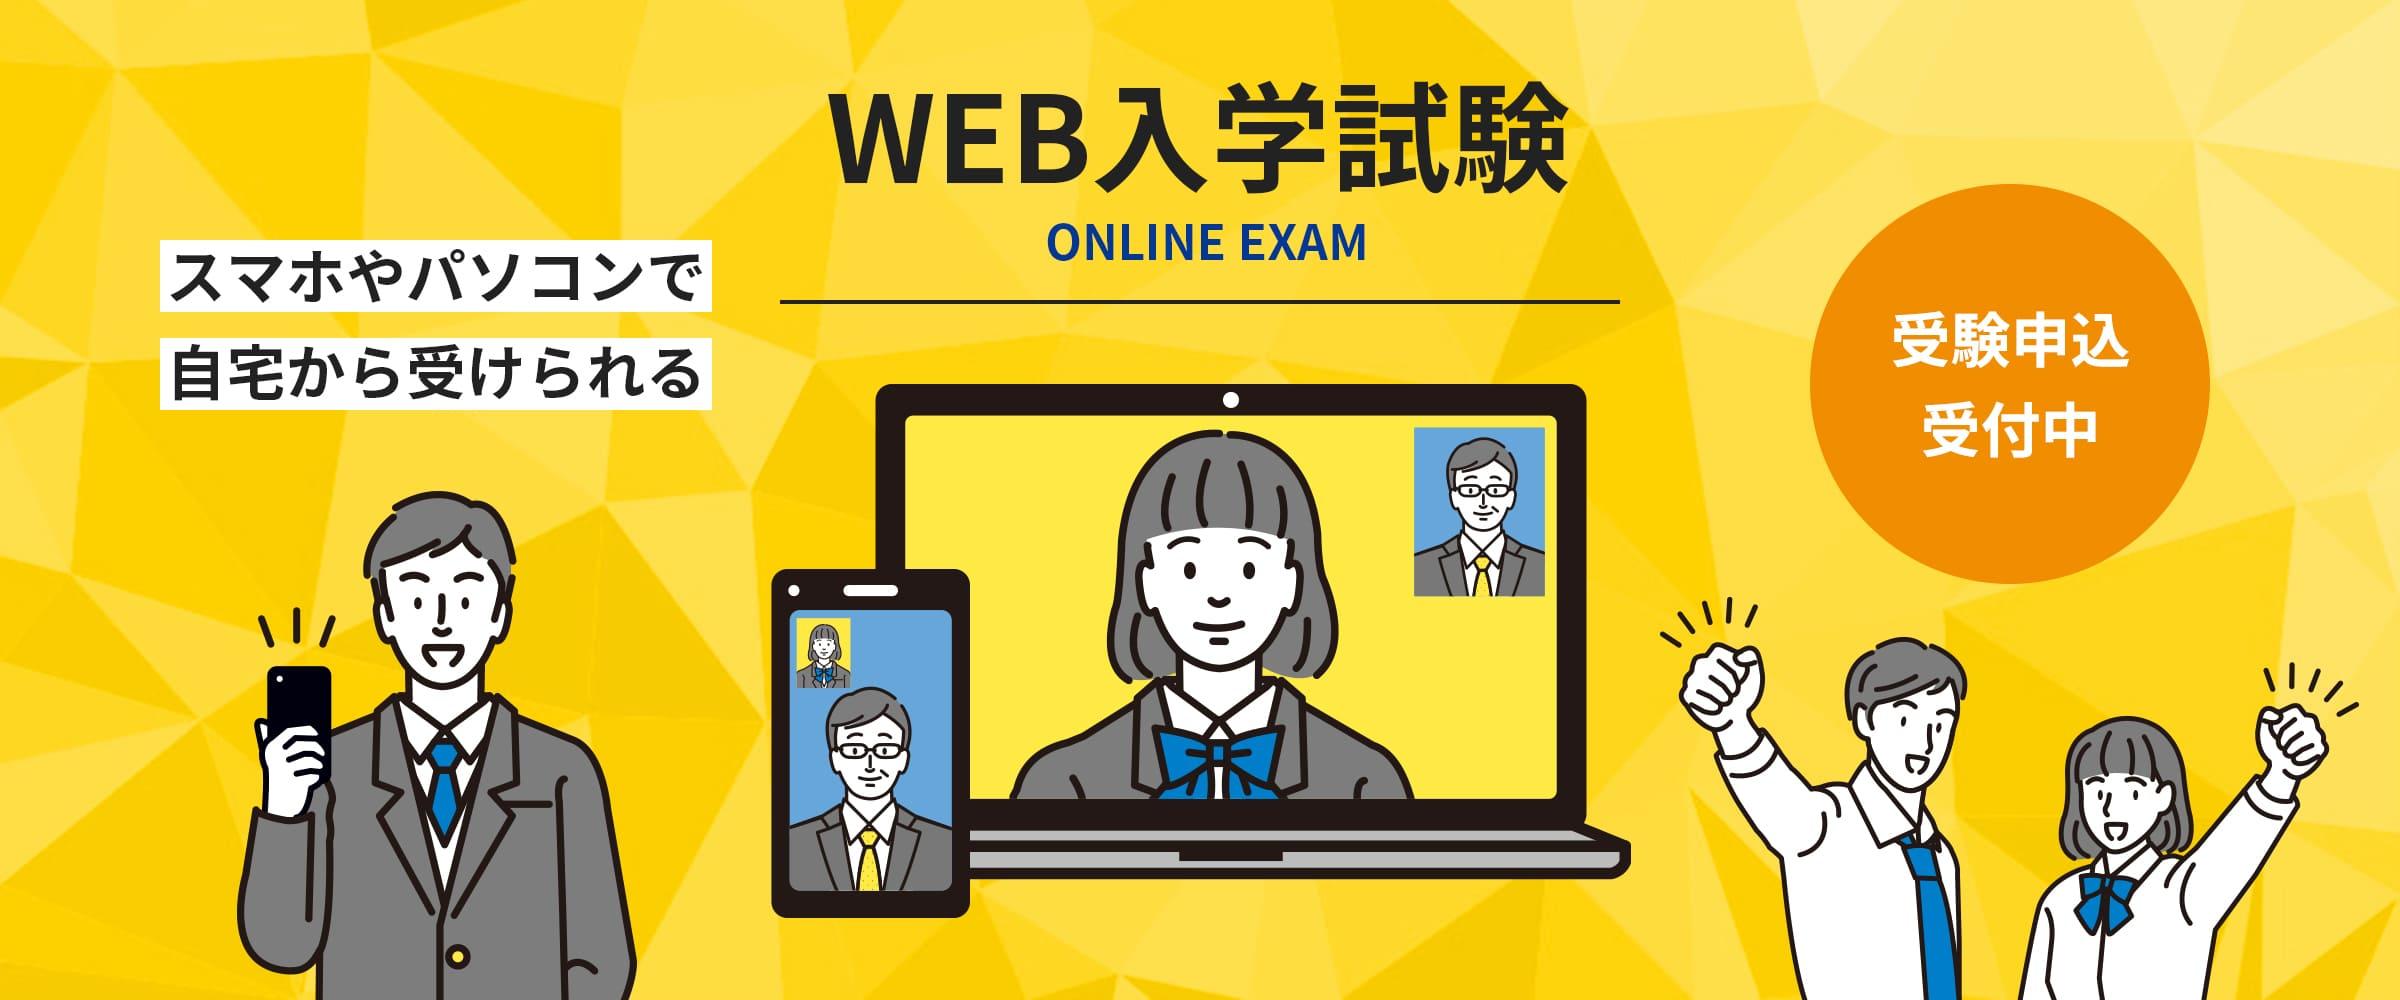 WEB入学試験